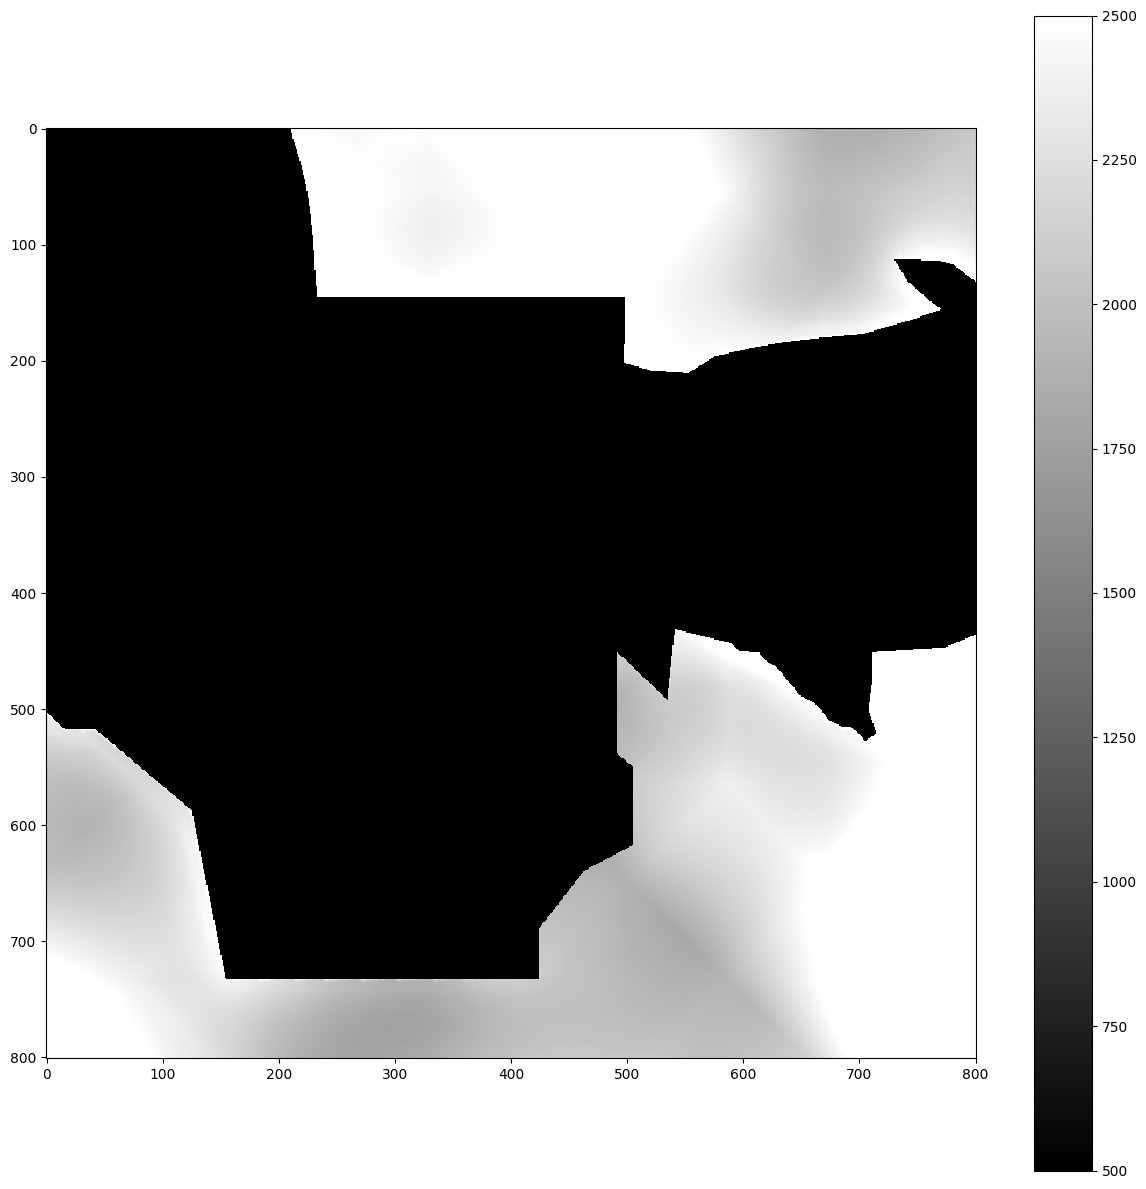 bench/seismic/wp/la_habra/meshes/velocity_model/plots/vs_0.png